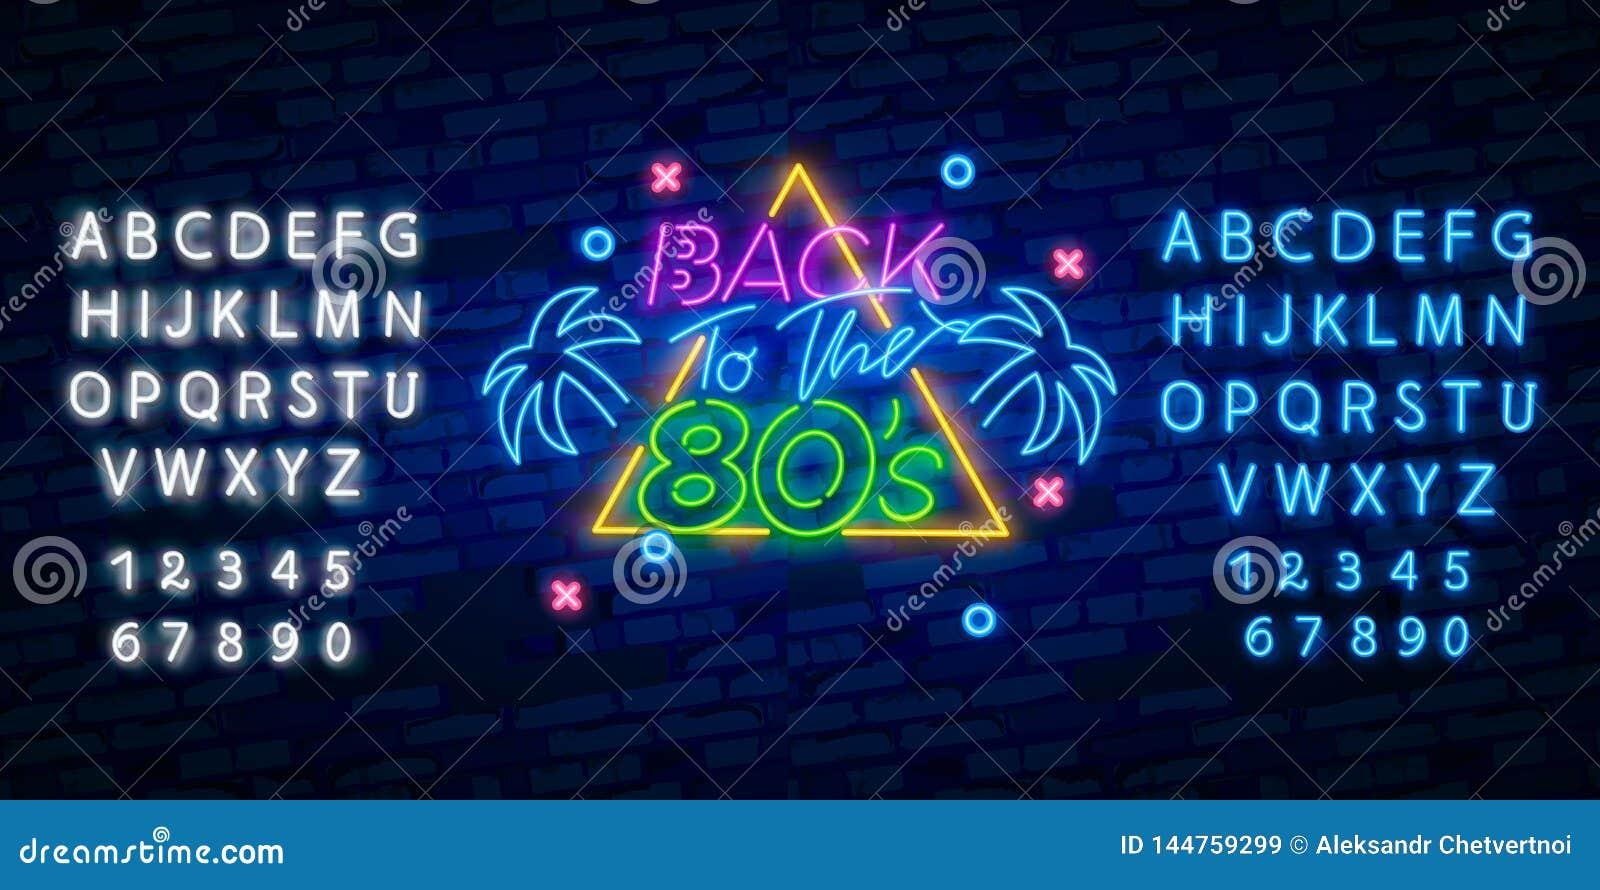 80s Neon Font